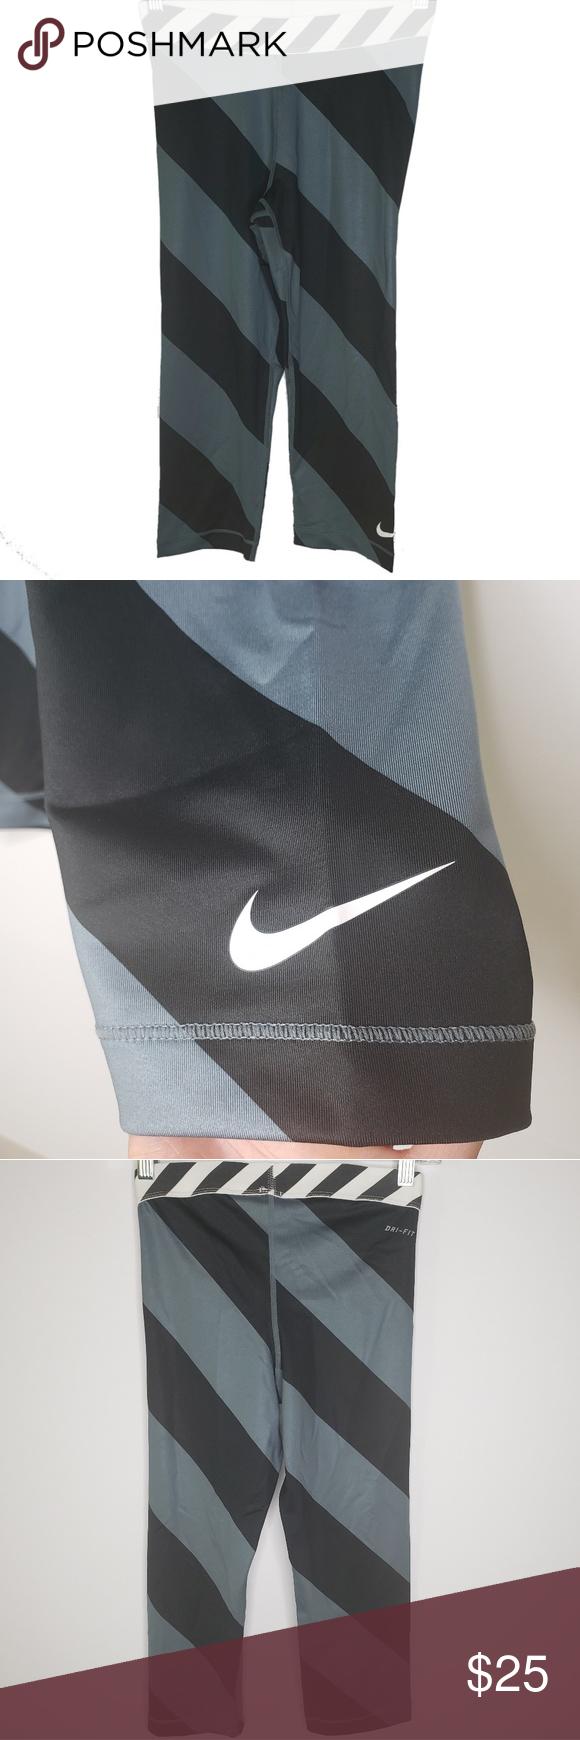 🖤 NIKE PRO 🖤 DRI FIT STRIPED CAPRI LEGGINGS | Clothes ...